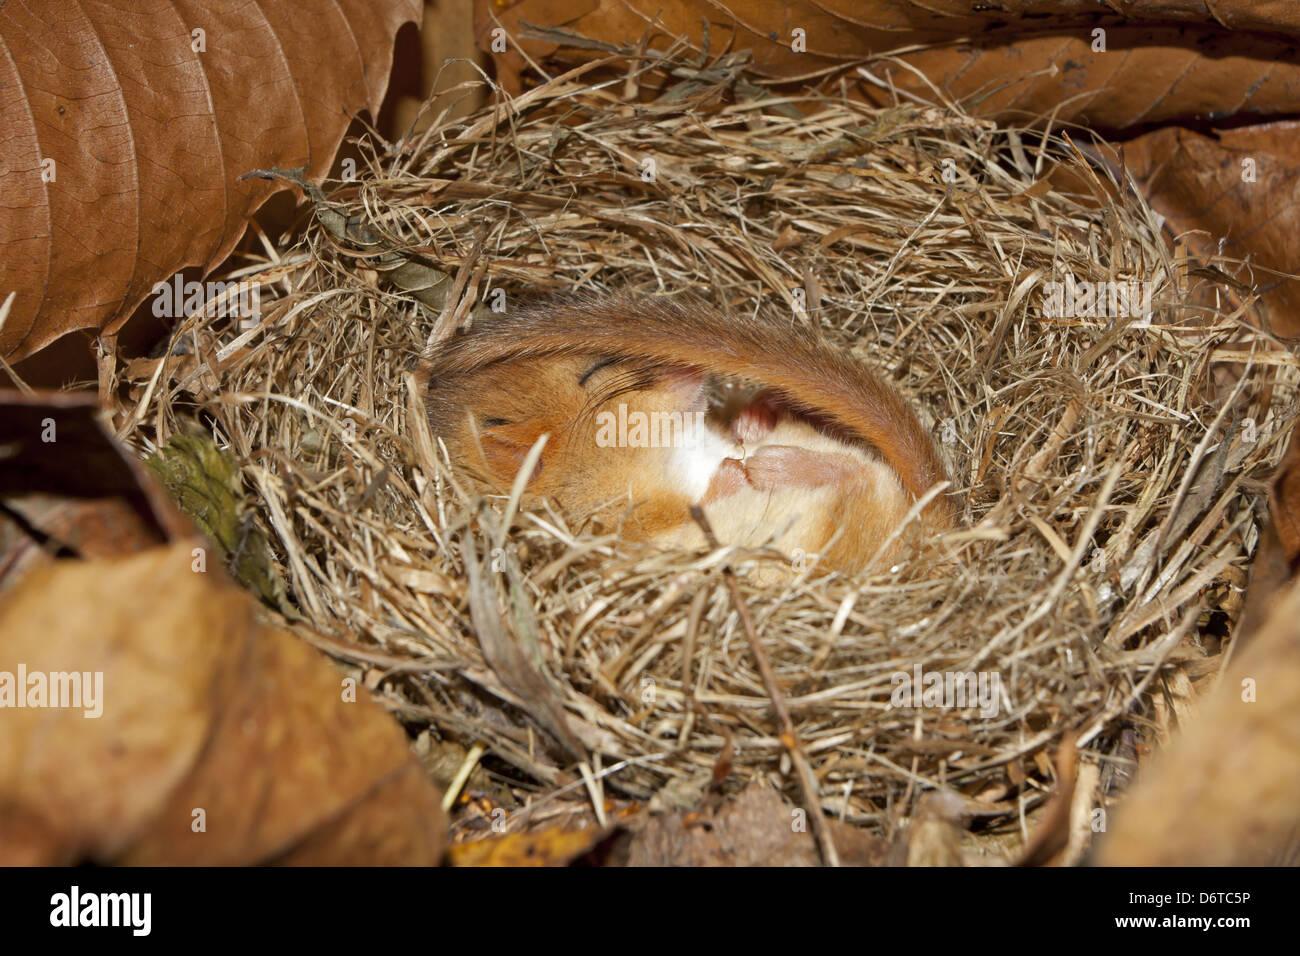 Hazel Dormouse (Muscardinus avellanarius) adult, hibernating in nest, Norfolk, England, January - Stock Image